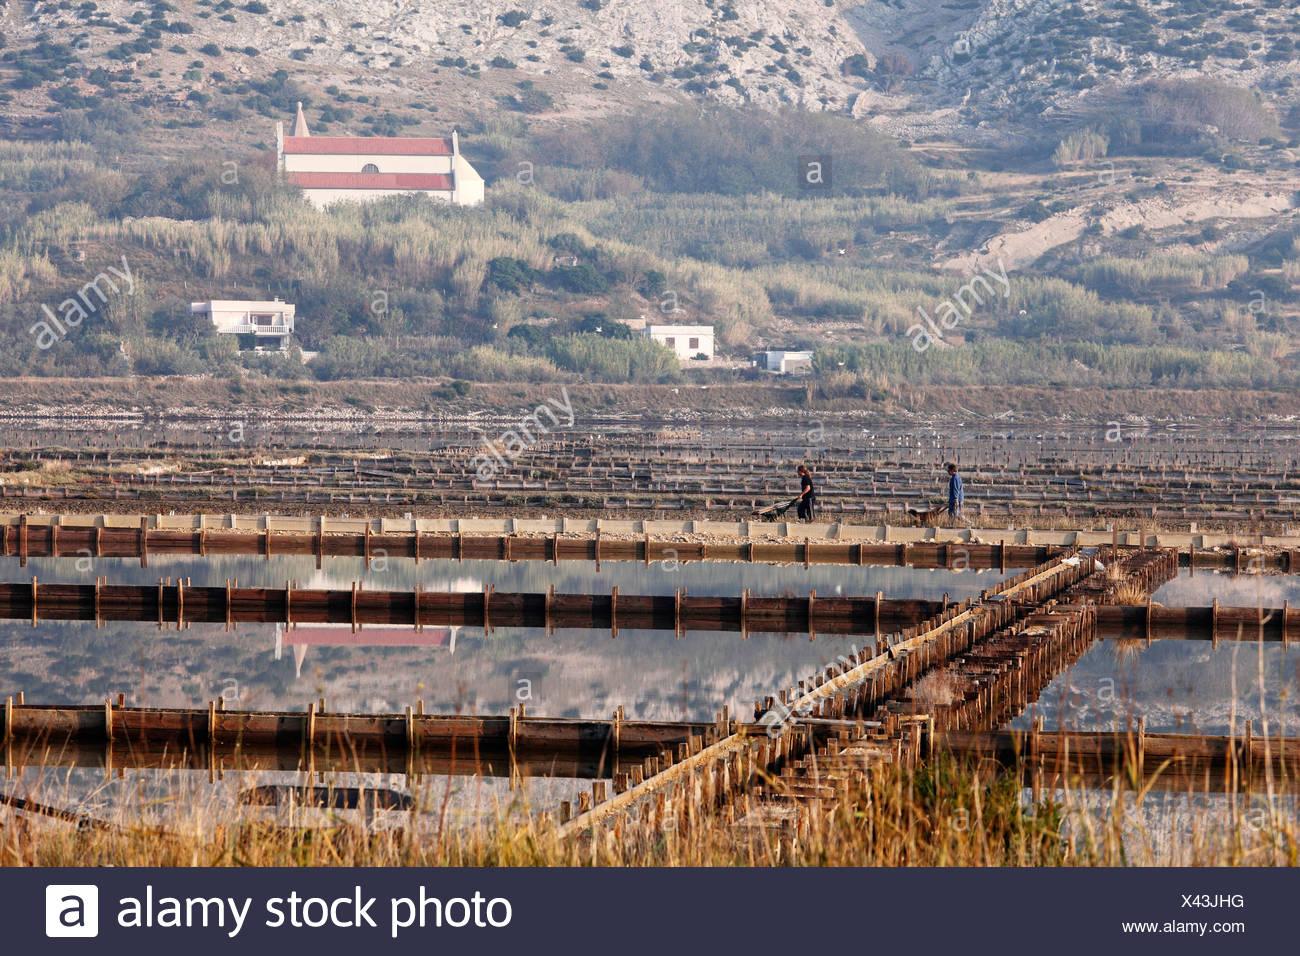 Salinas and Stari Grad, Pag island, Dalmatia, Adriatic Sea, Croatia, Europe - Stock Image